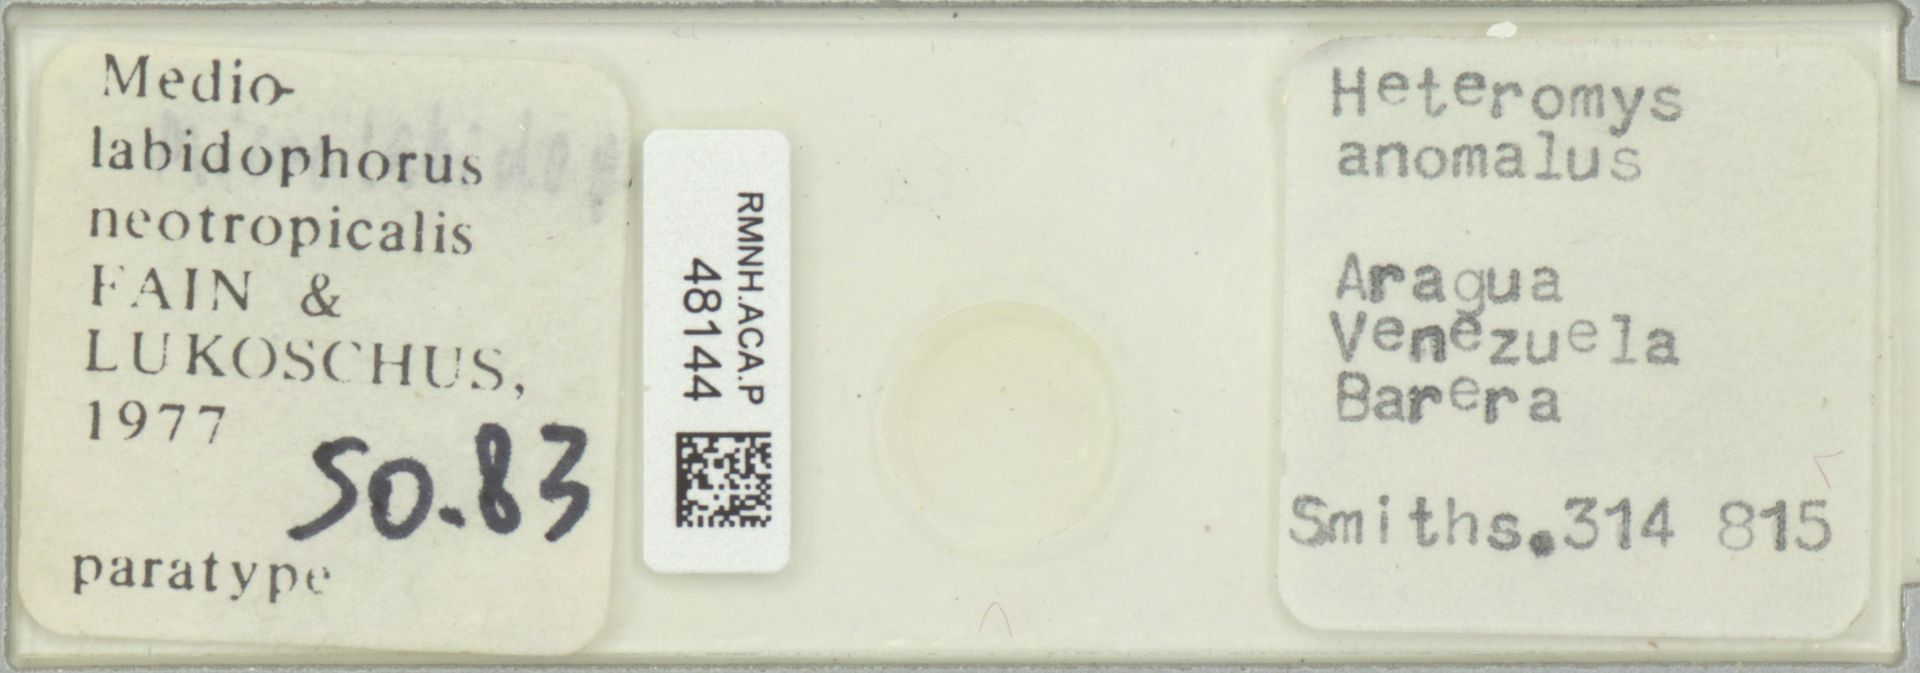 RMNH.ACA.P.48144 | Mediolabidophorus neotropicalis Fain & Lukoschus 1977